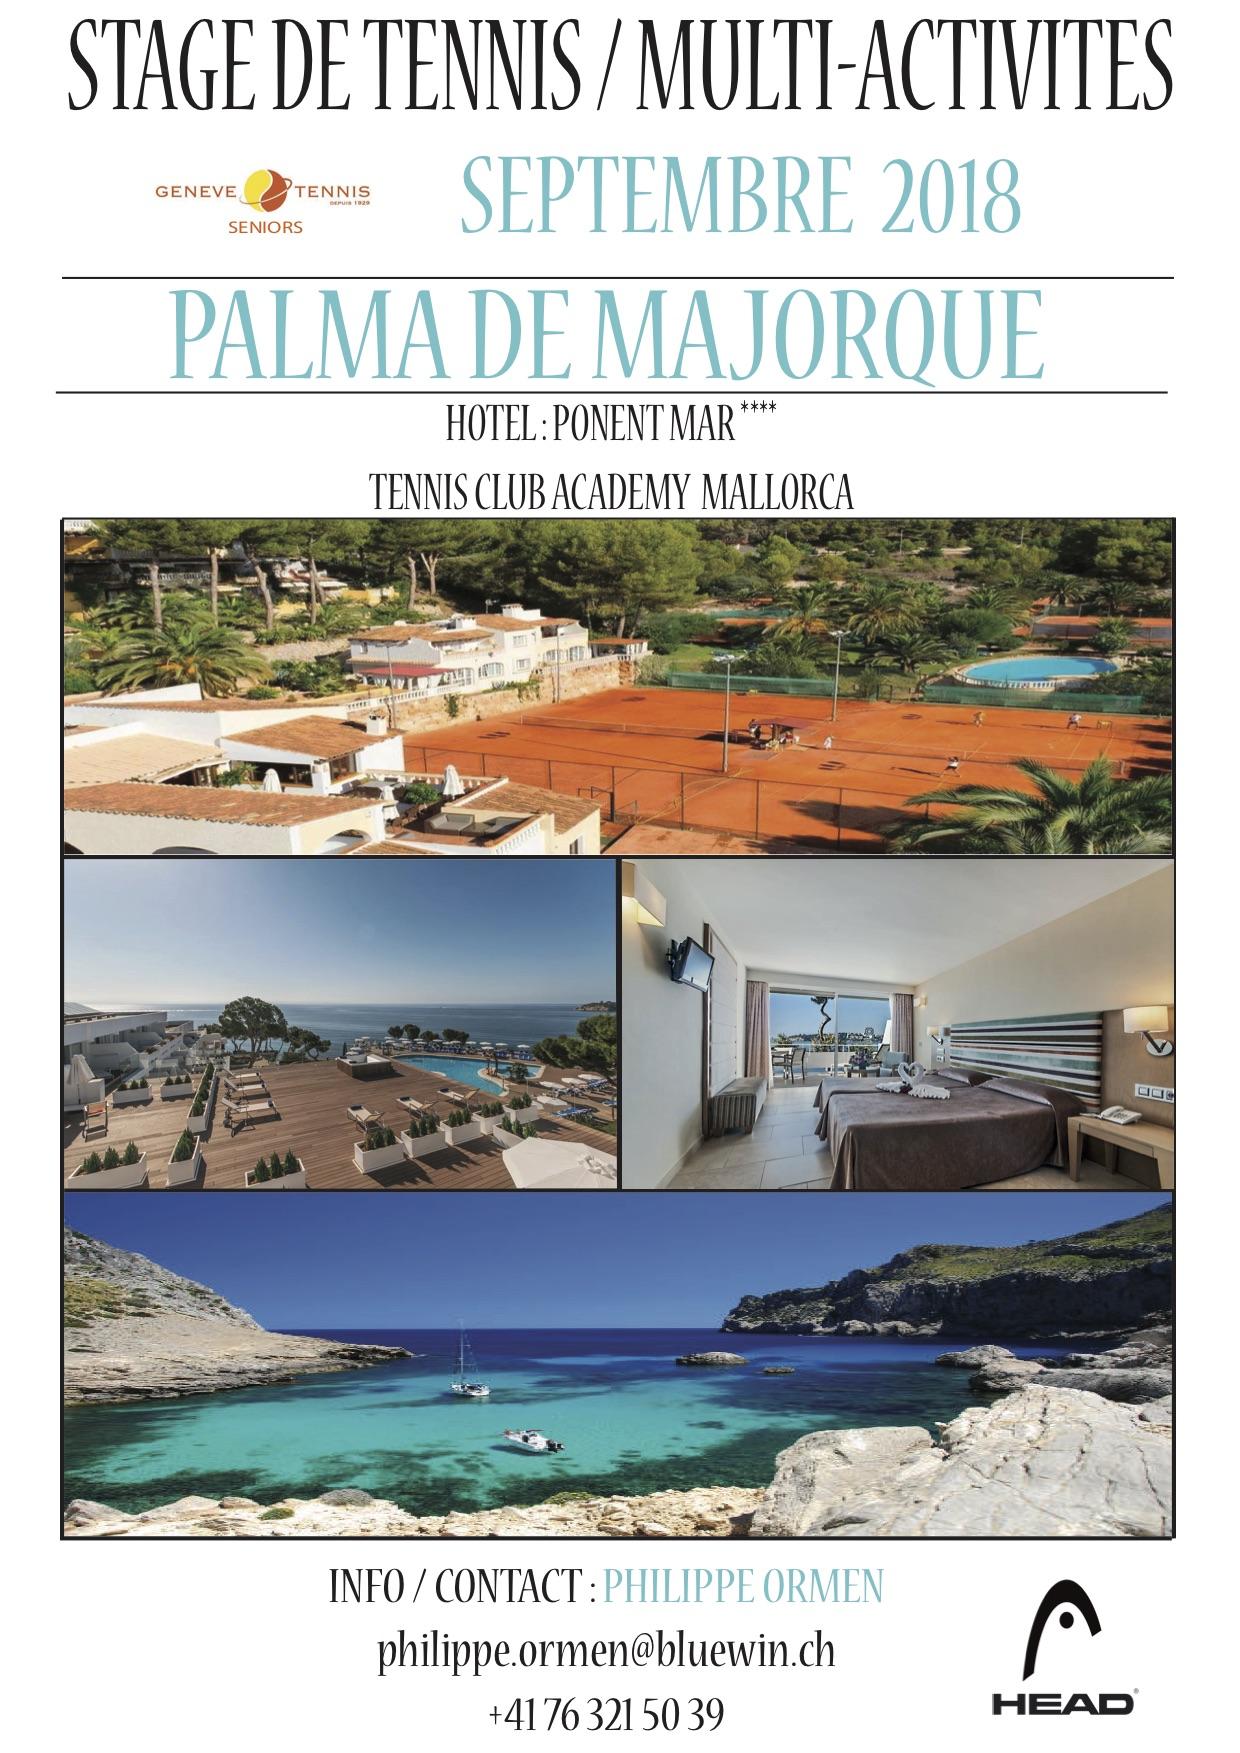 PALMA DE MAJORQUE seniors-SEPTEMBRE - copie